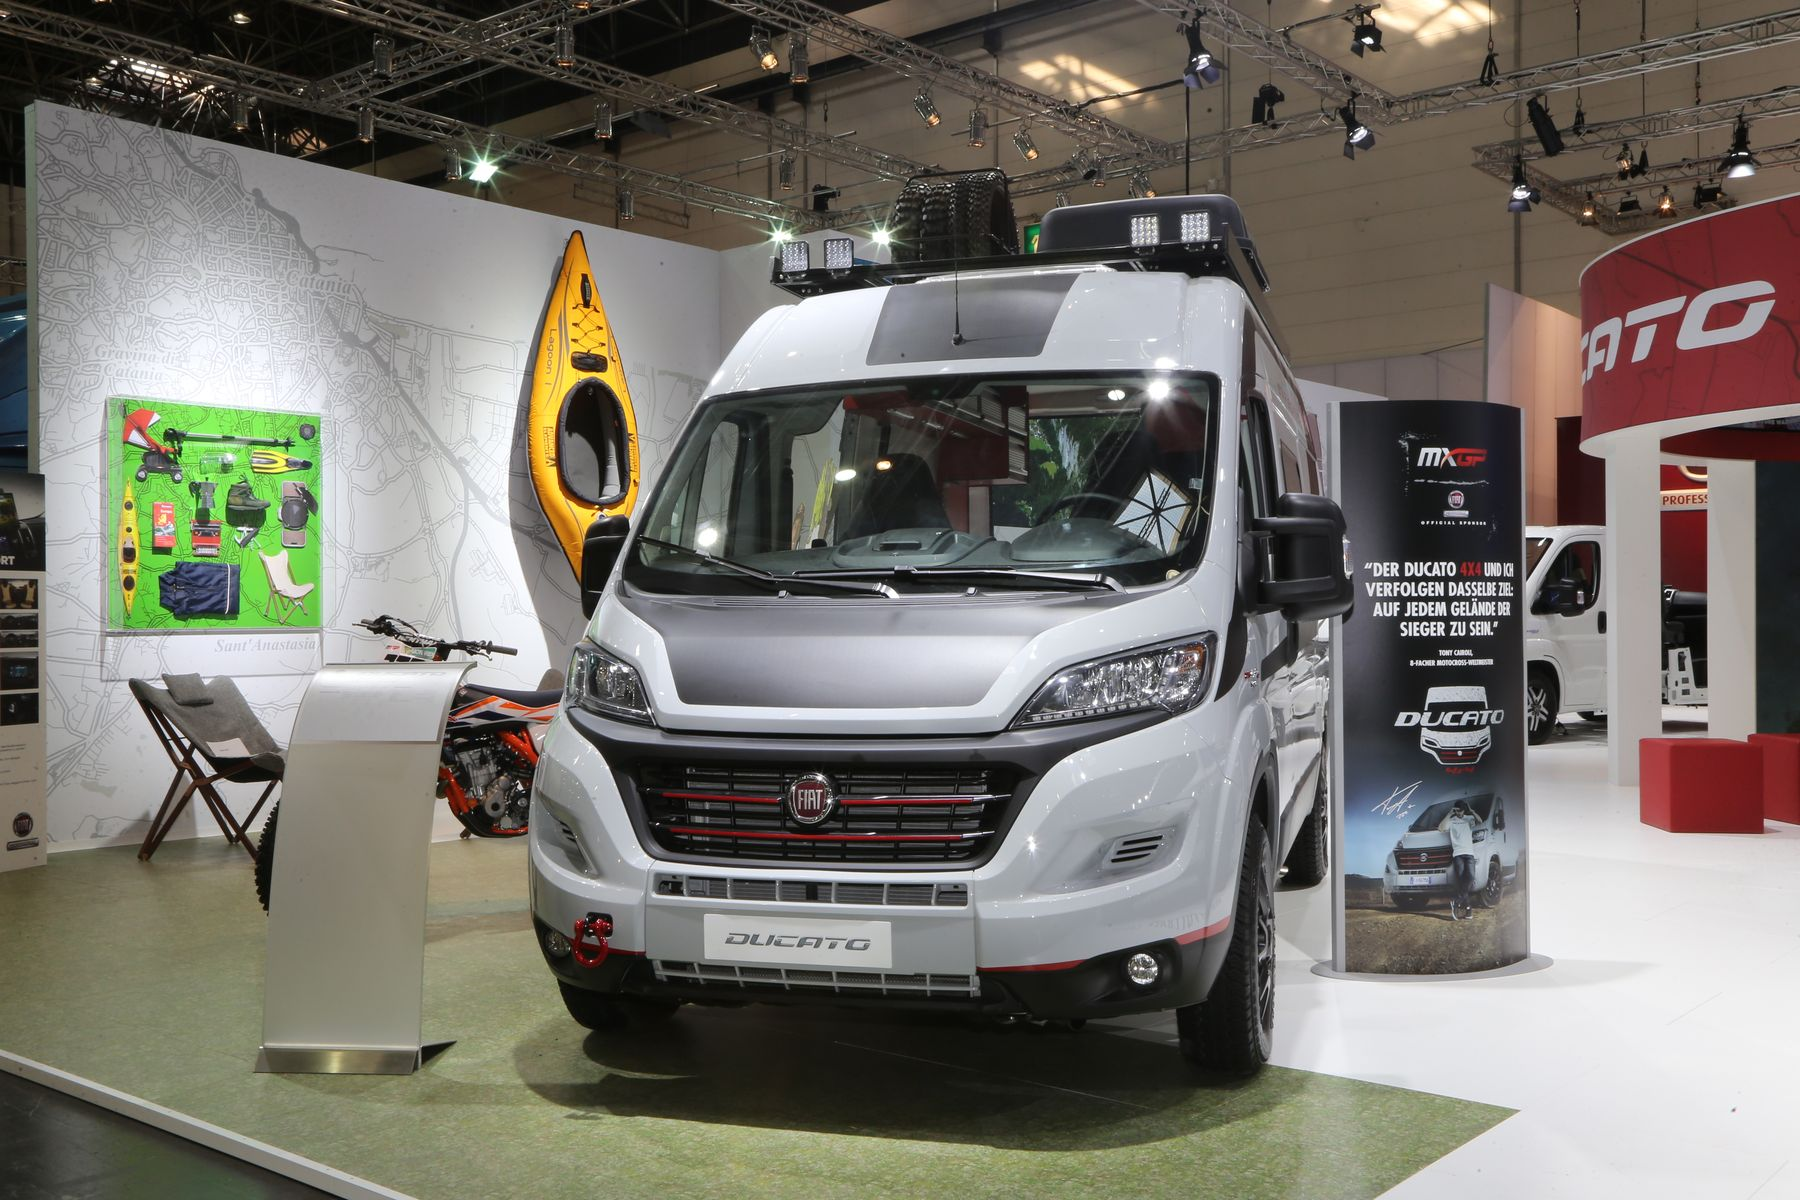 Fiat Professional, Caravan Salon 2017, Düsseldorf